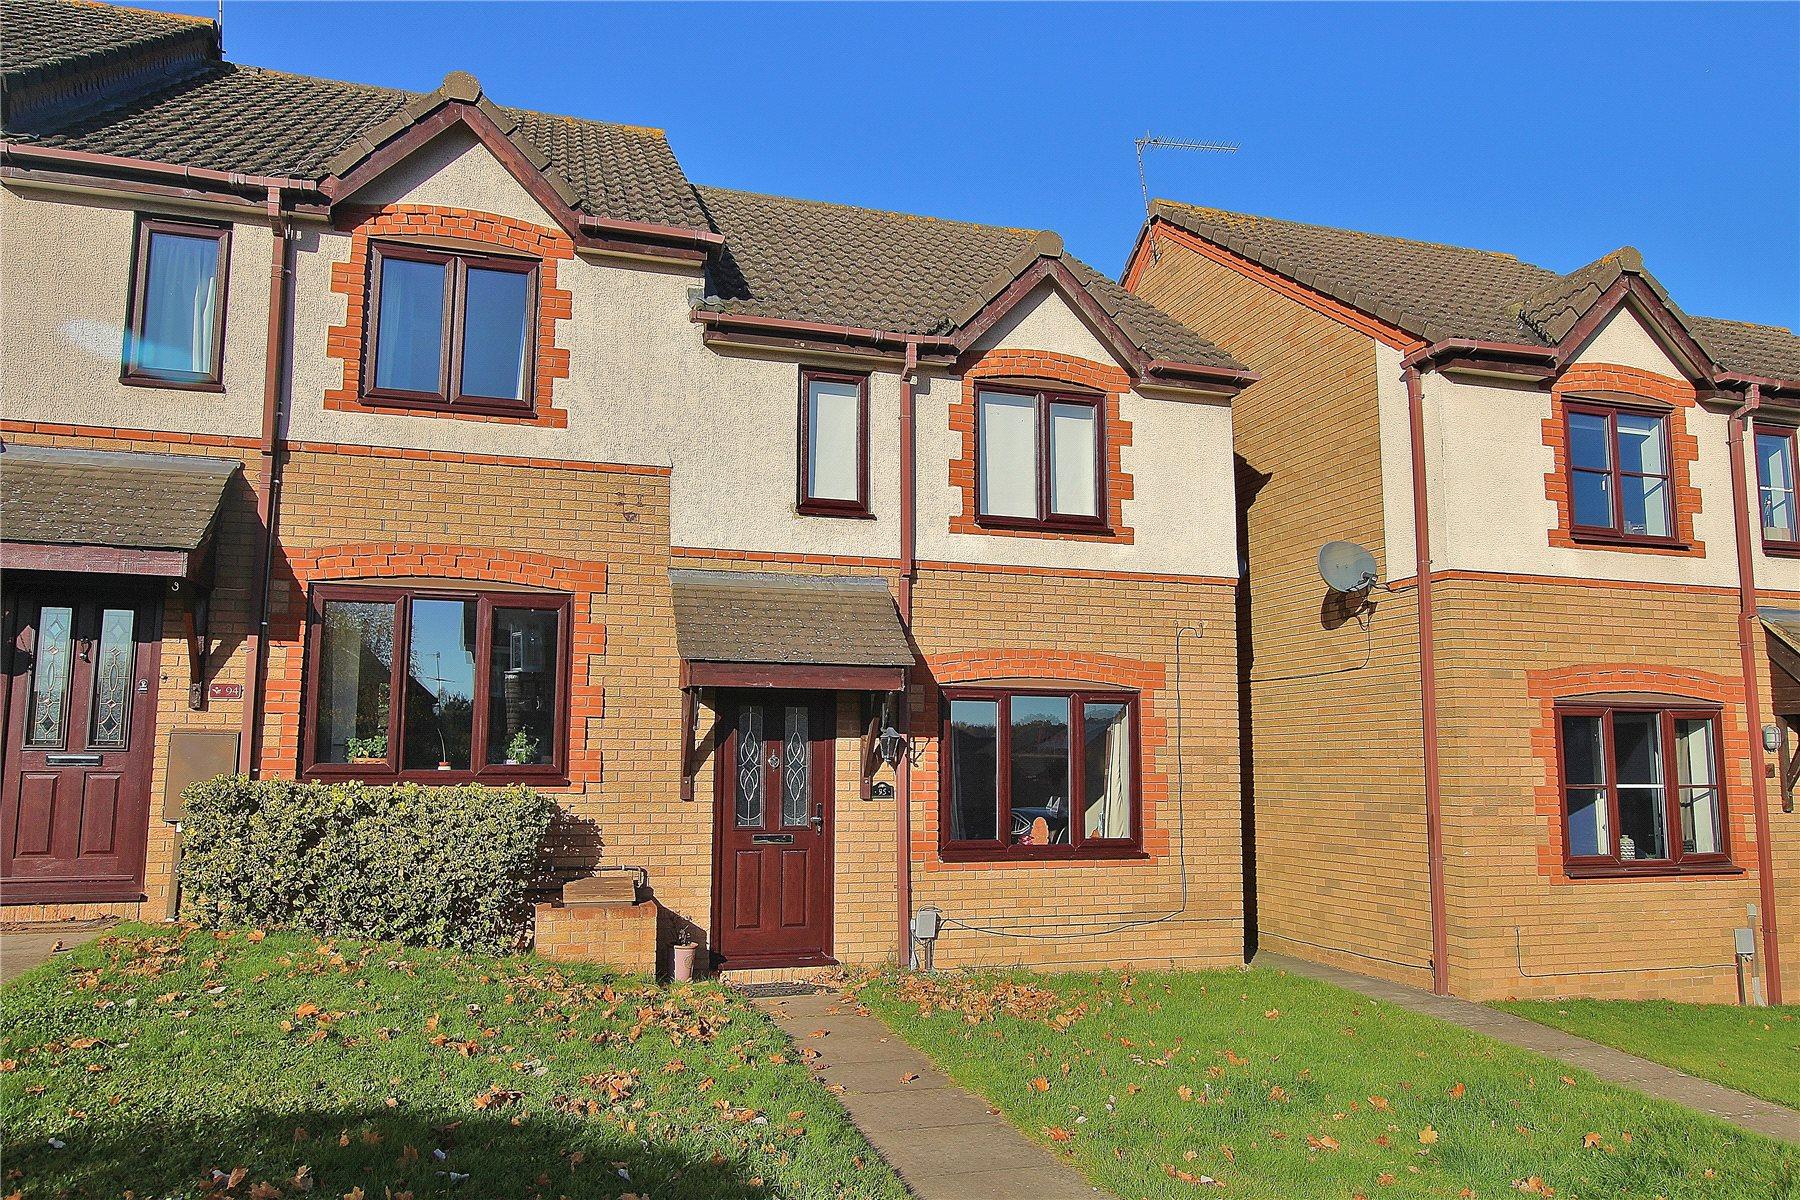 3 Bedrooms End Of Terrace House for sale in Percheron Drive, Knaphill, Surrey, GU21